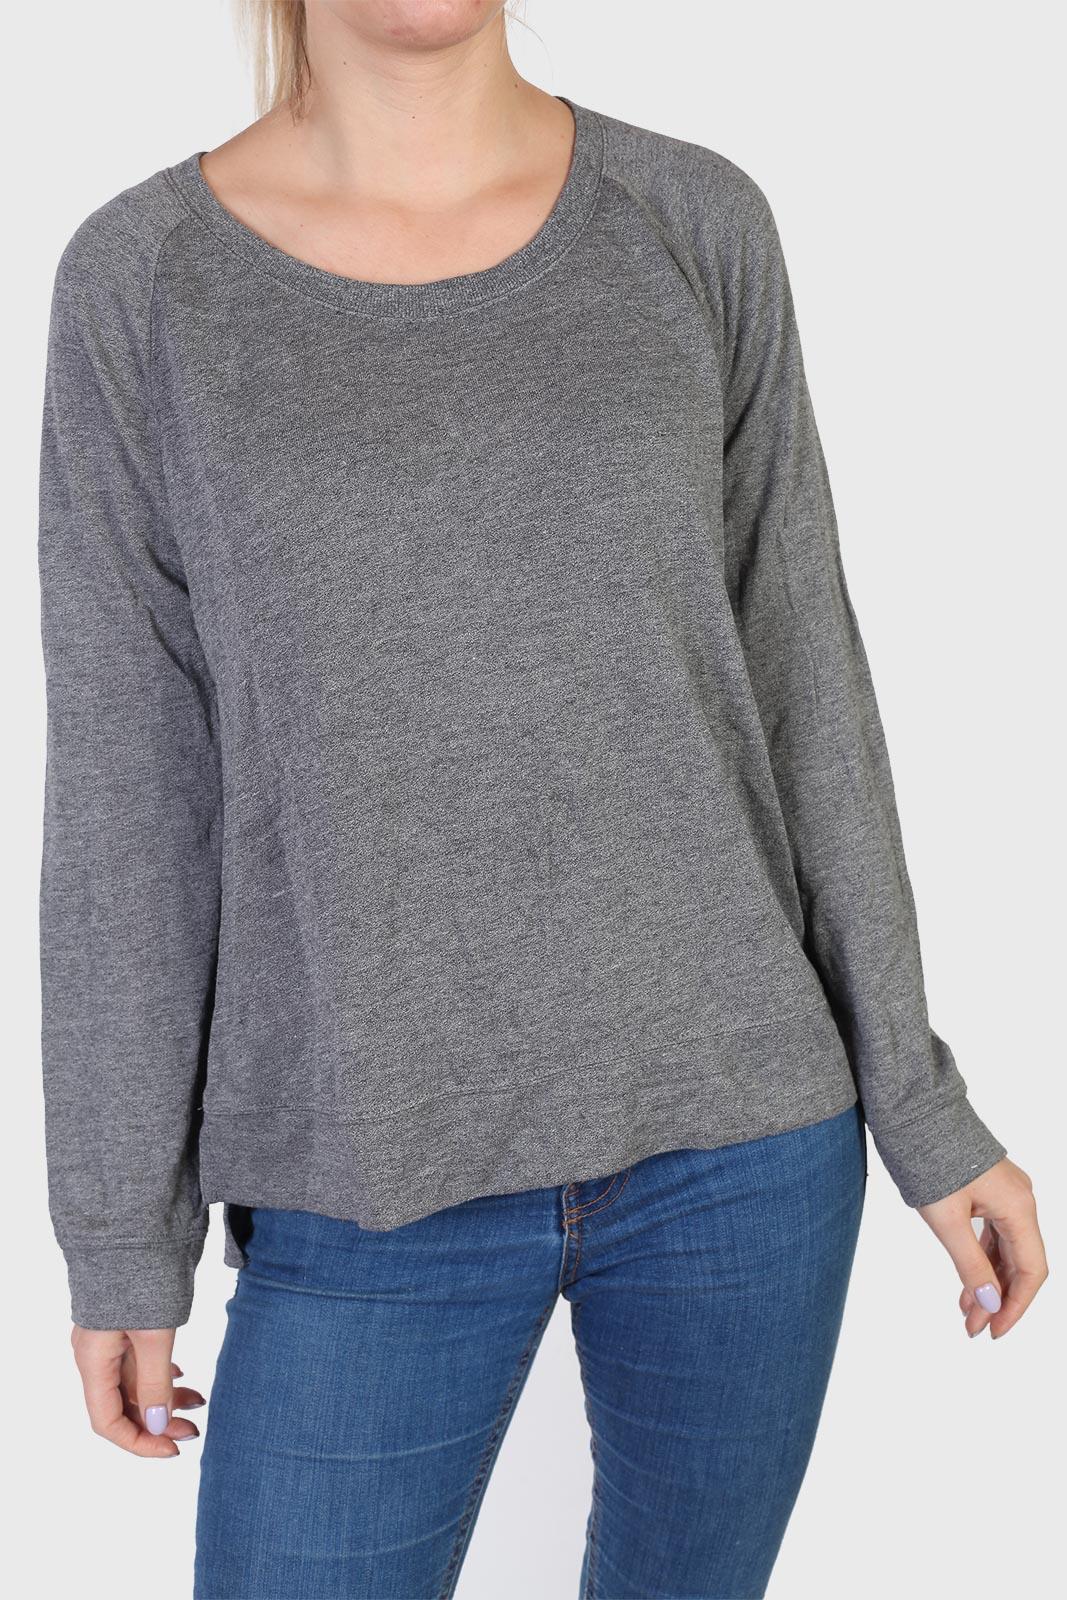 Асимметричная женская кофта серого цвета от ТМ Shimera